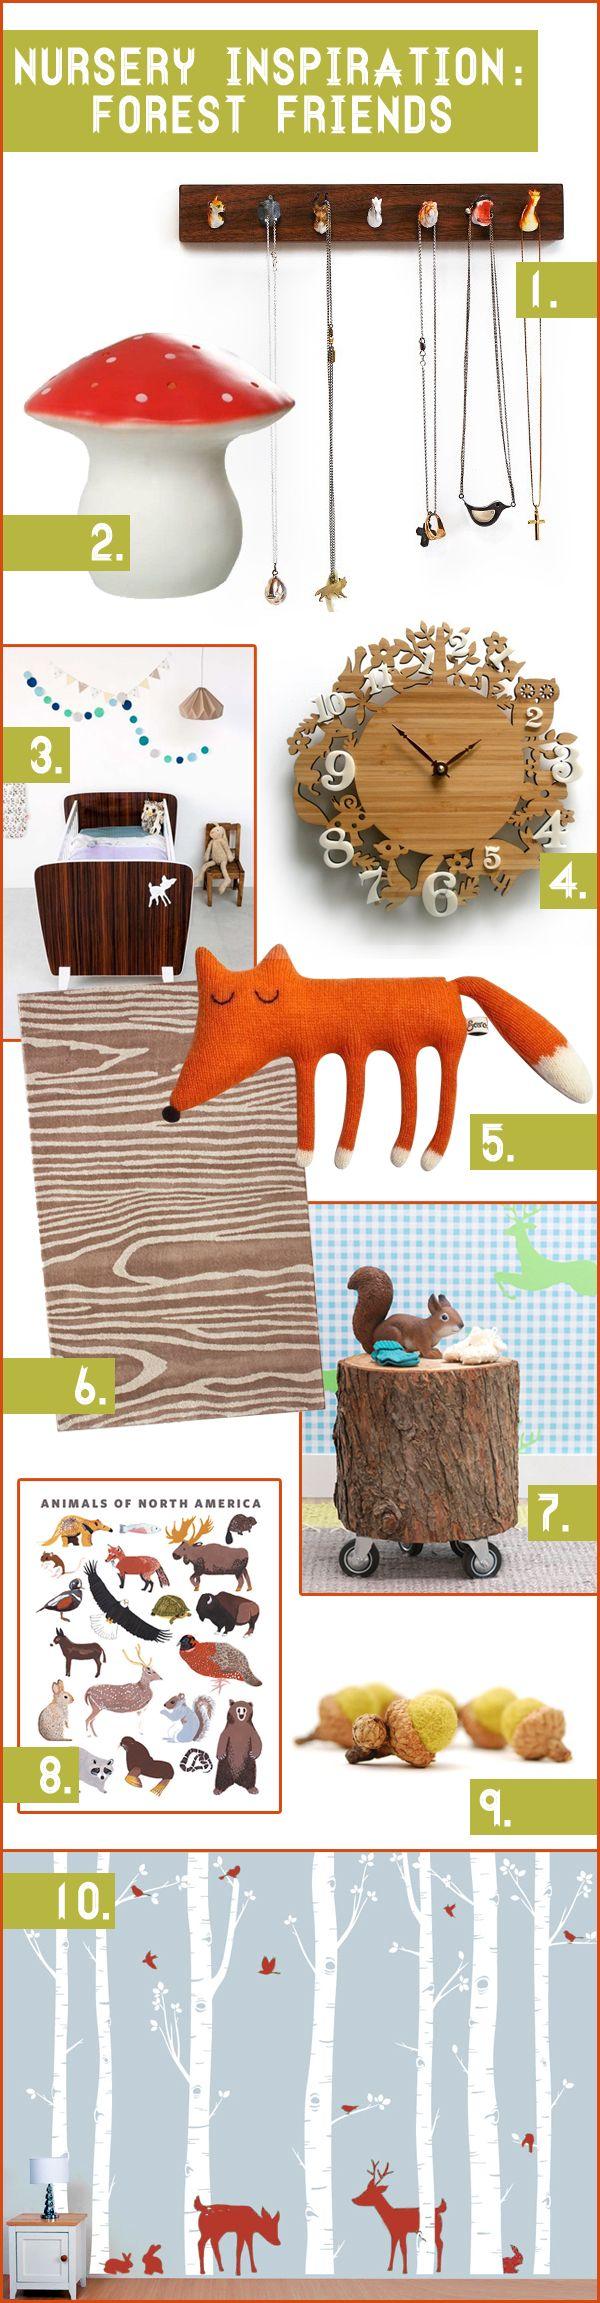 Woodland nursery inspiration : Forest Friends - Belle Bébés